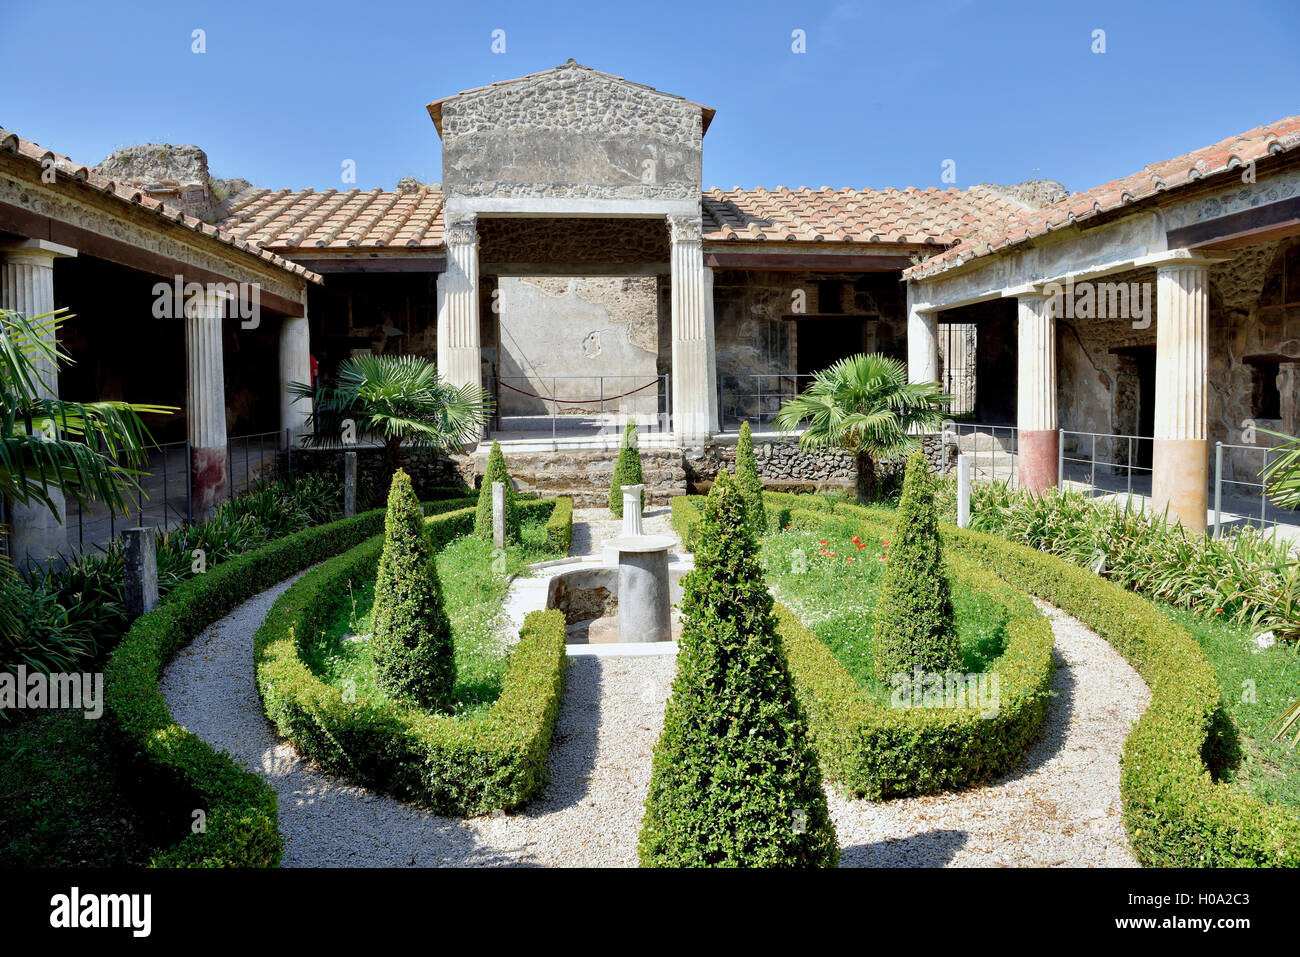 Casa de Venus, la antigua ciudad de Pompeya, Campania, Italia Foto de stock